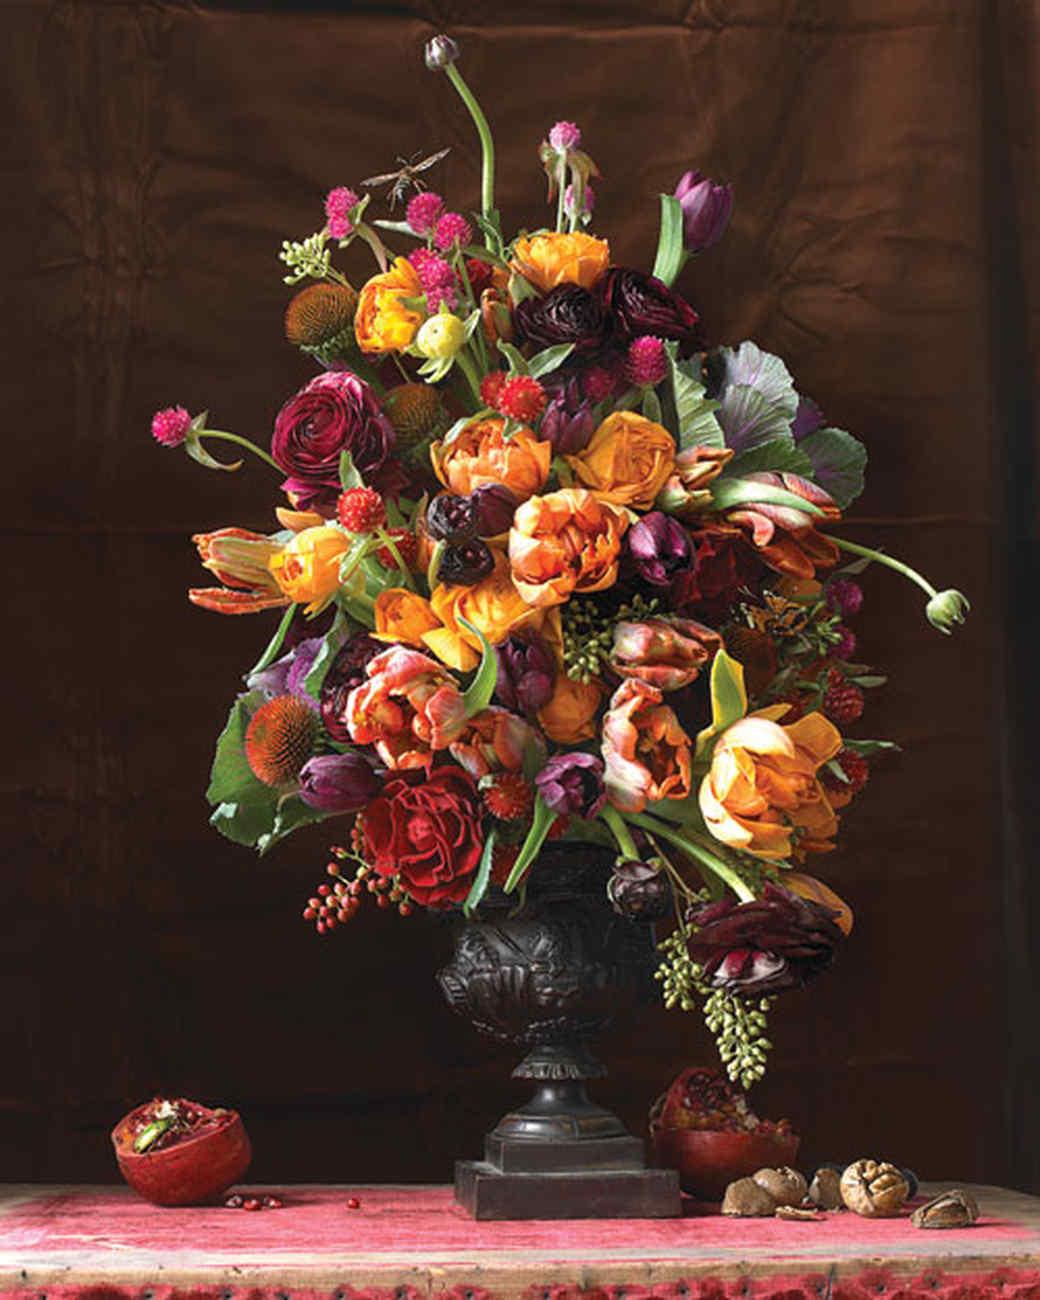 Fall Apples Wallpaper Dutch Floral Displays Martha Stewart